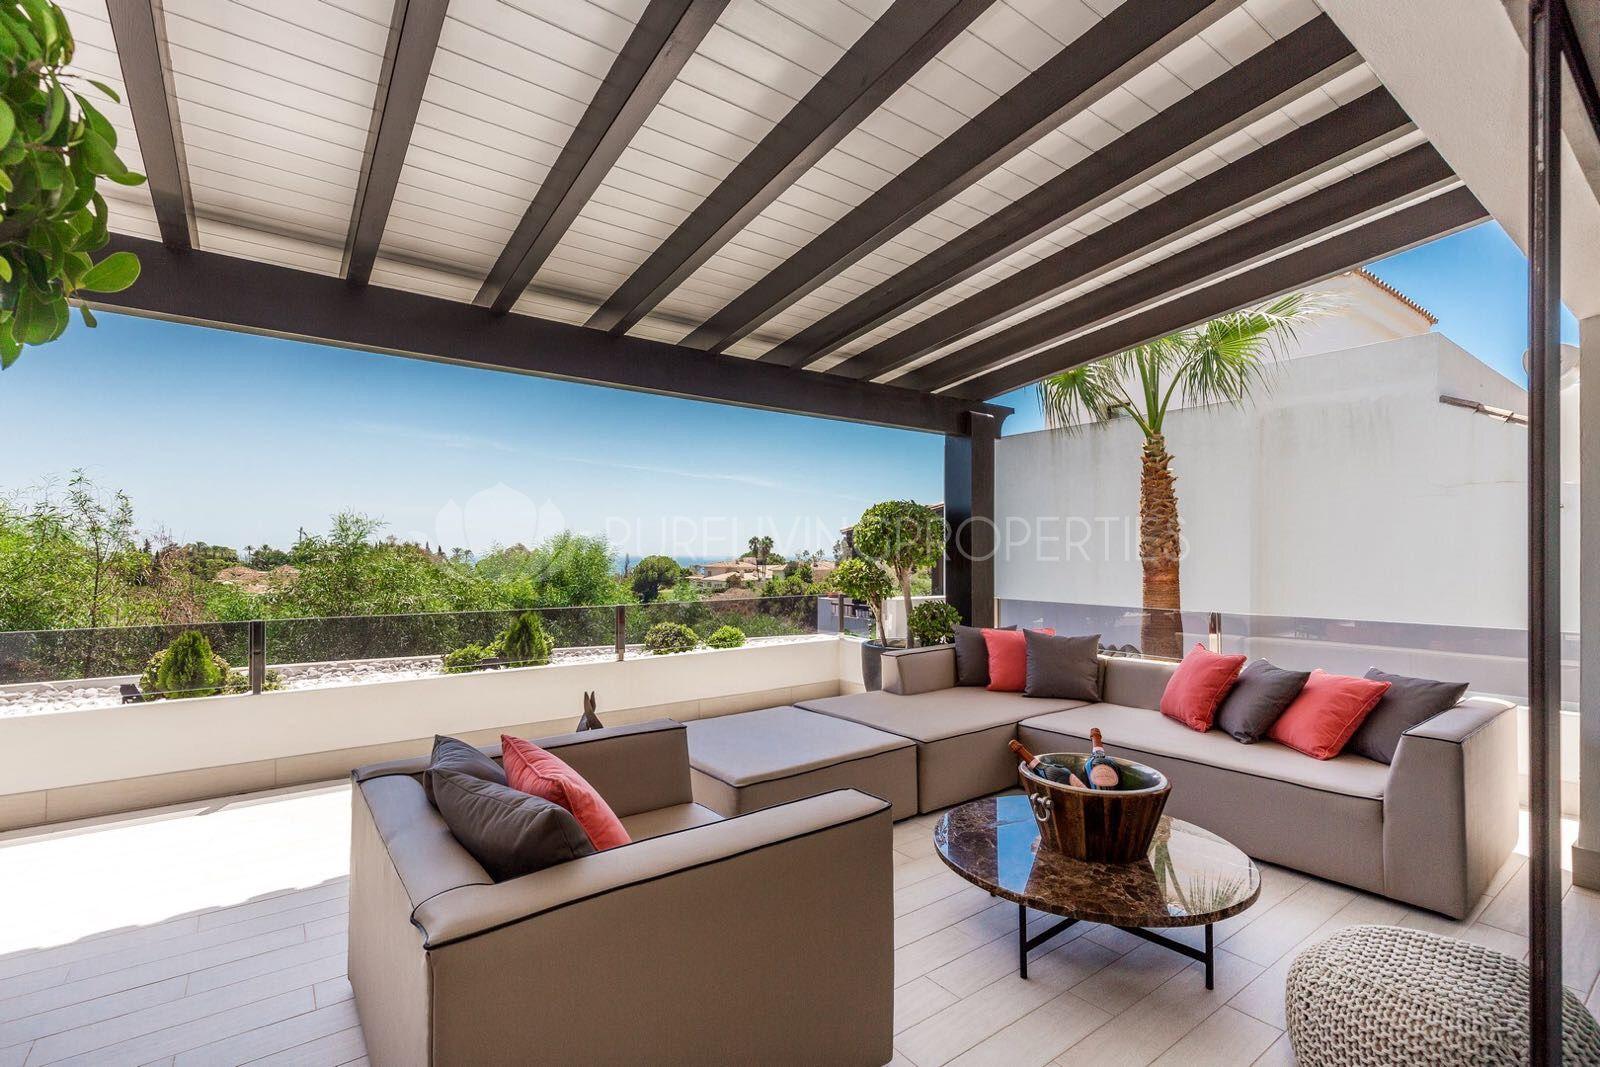 Las Lomas de Marbella Club, luxury and privacy in the Golden Mile